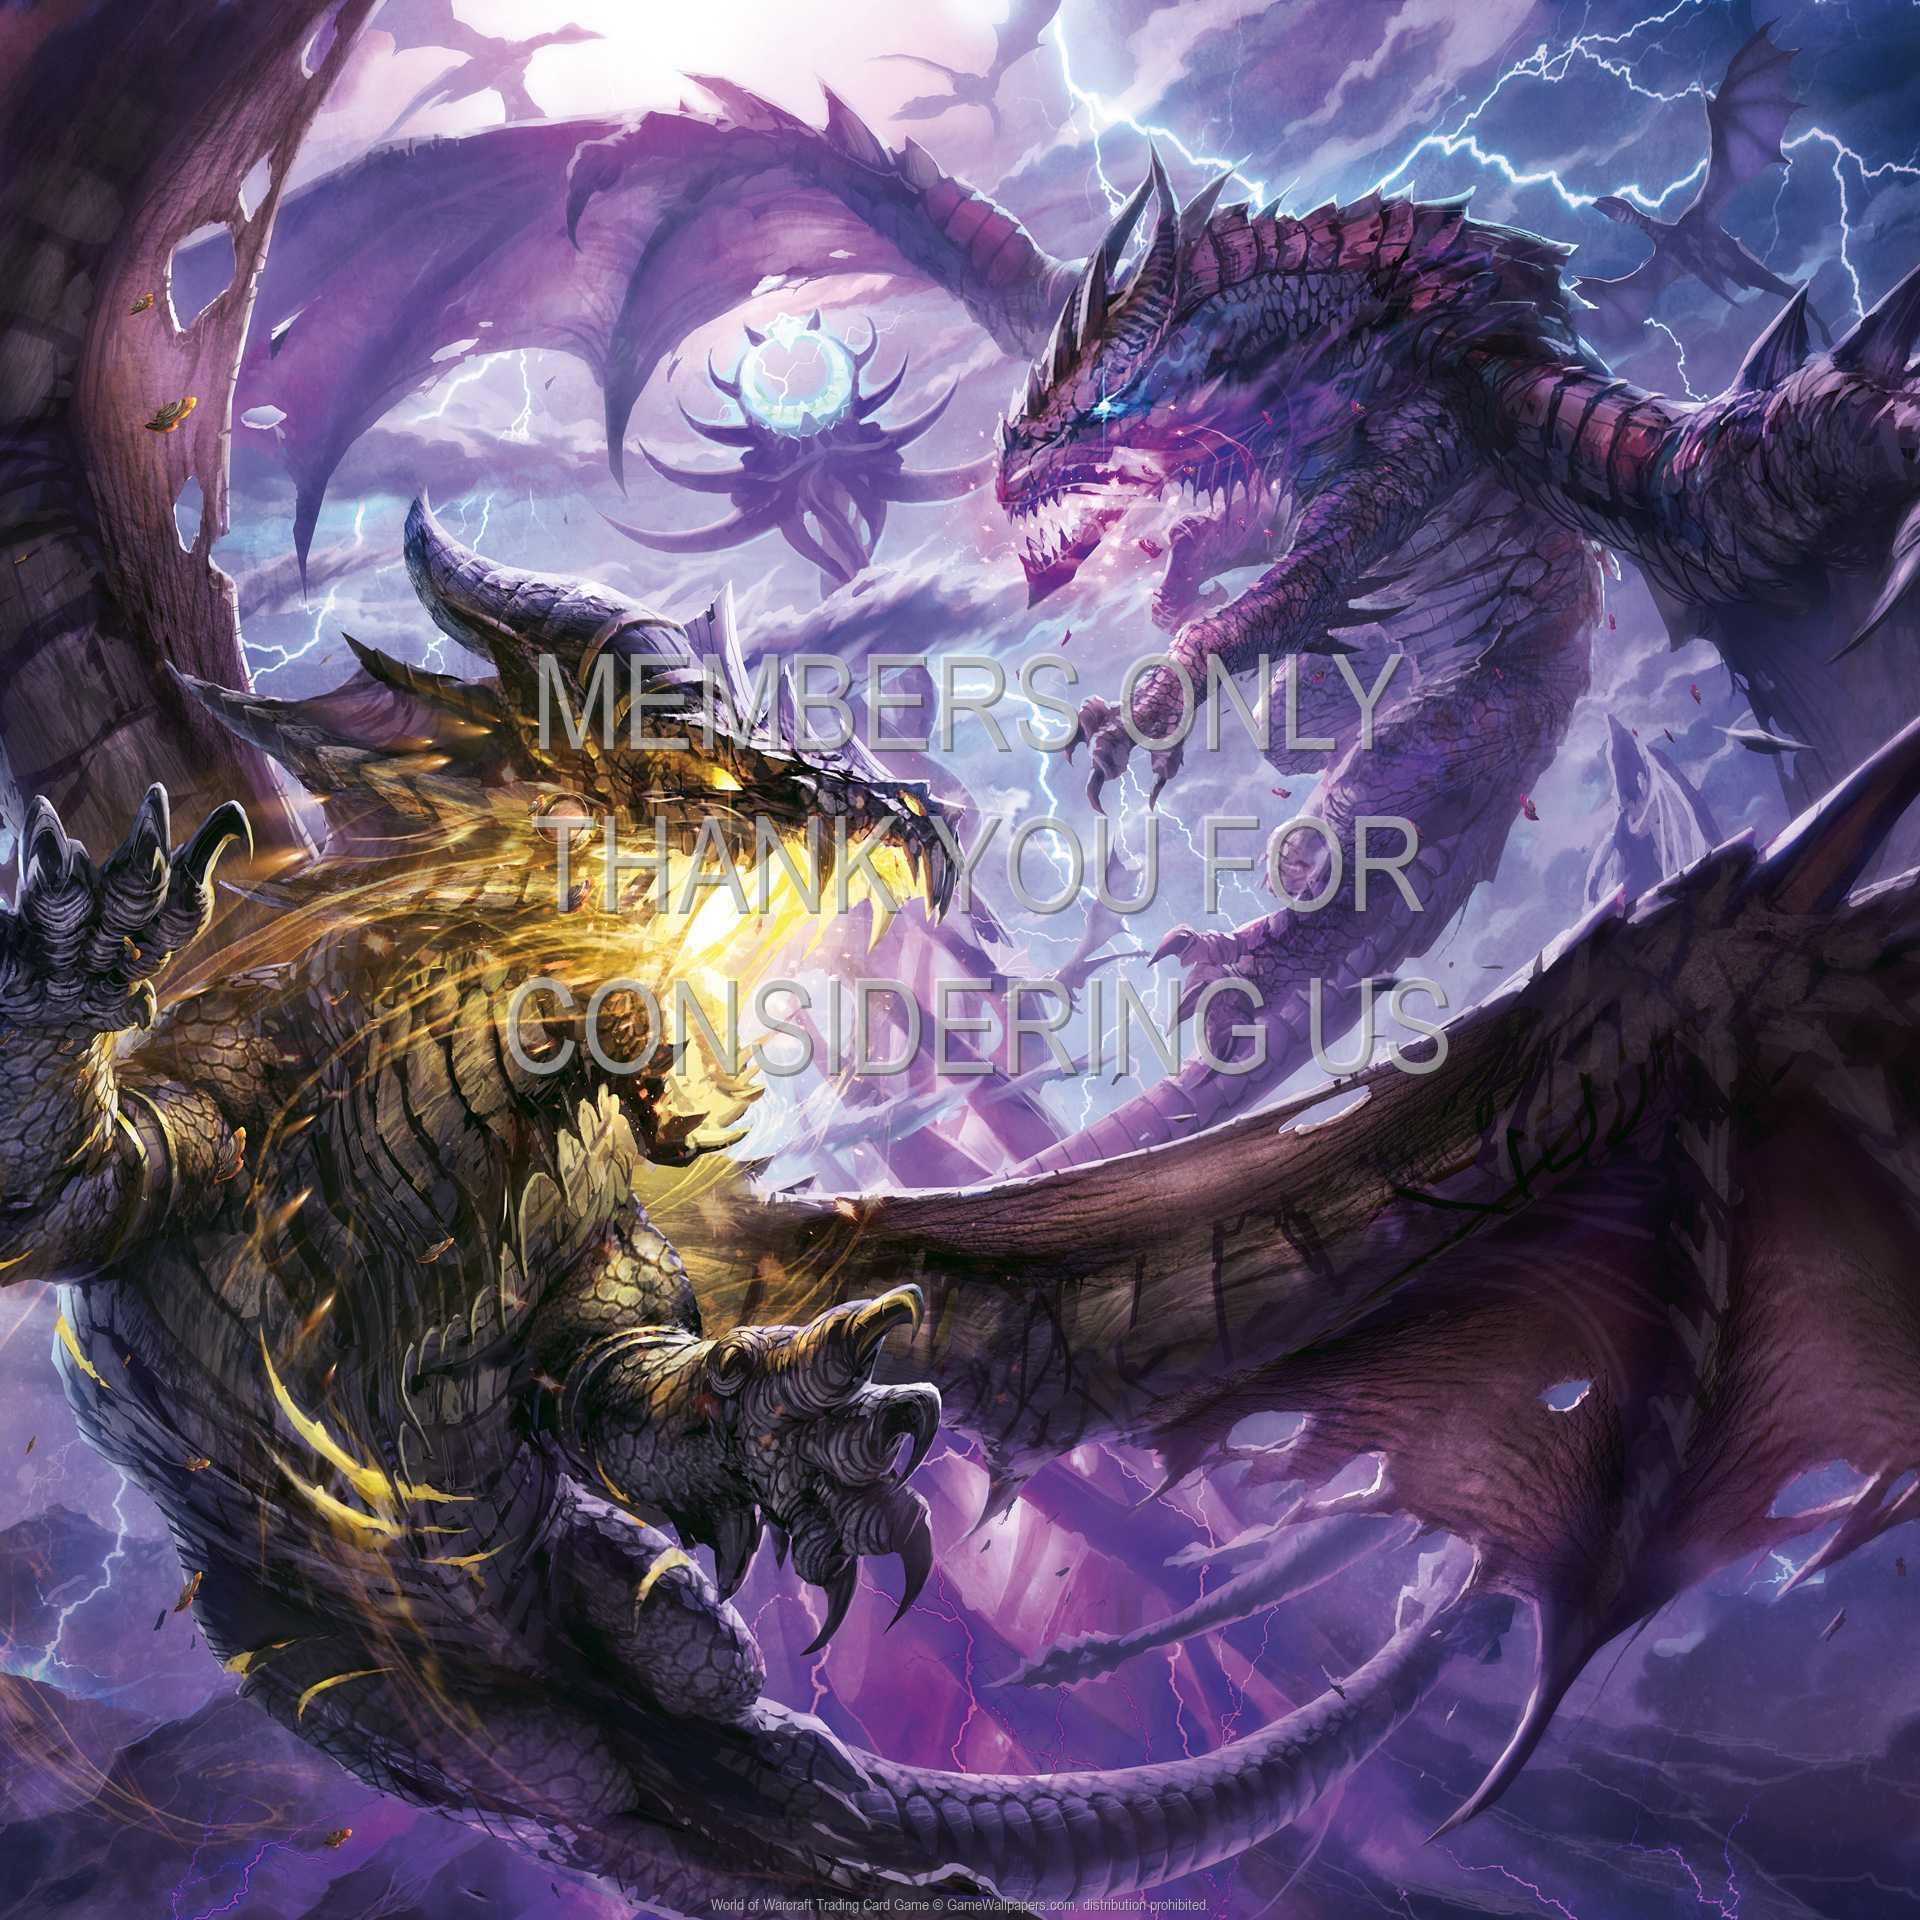 World of Warcraft: Trading Card Game 1080p Horizontal Handy Hintergrundbild 56